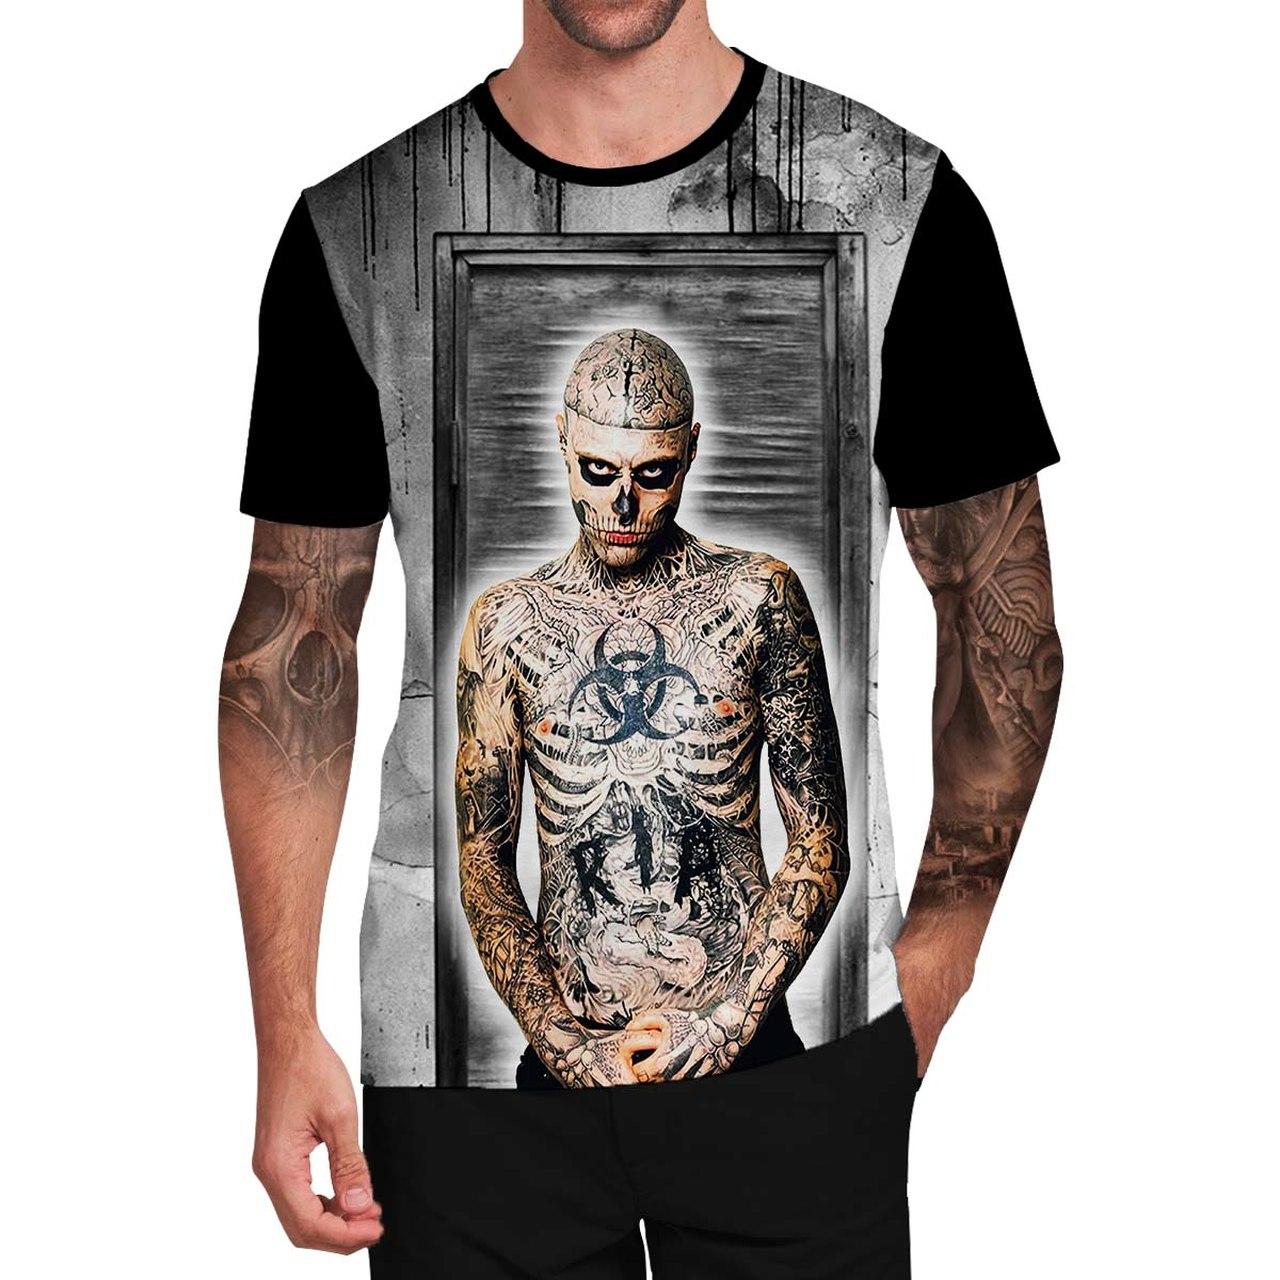 Stompy Camiseta Tattoo Tatuagem Caveira Skull 109